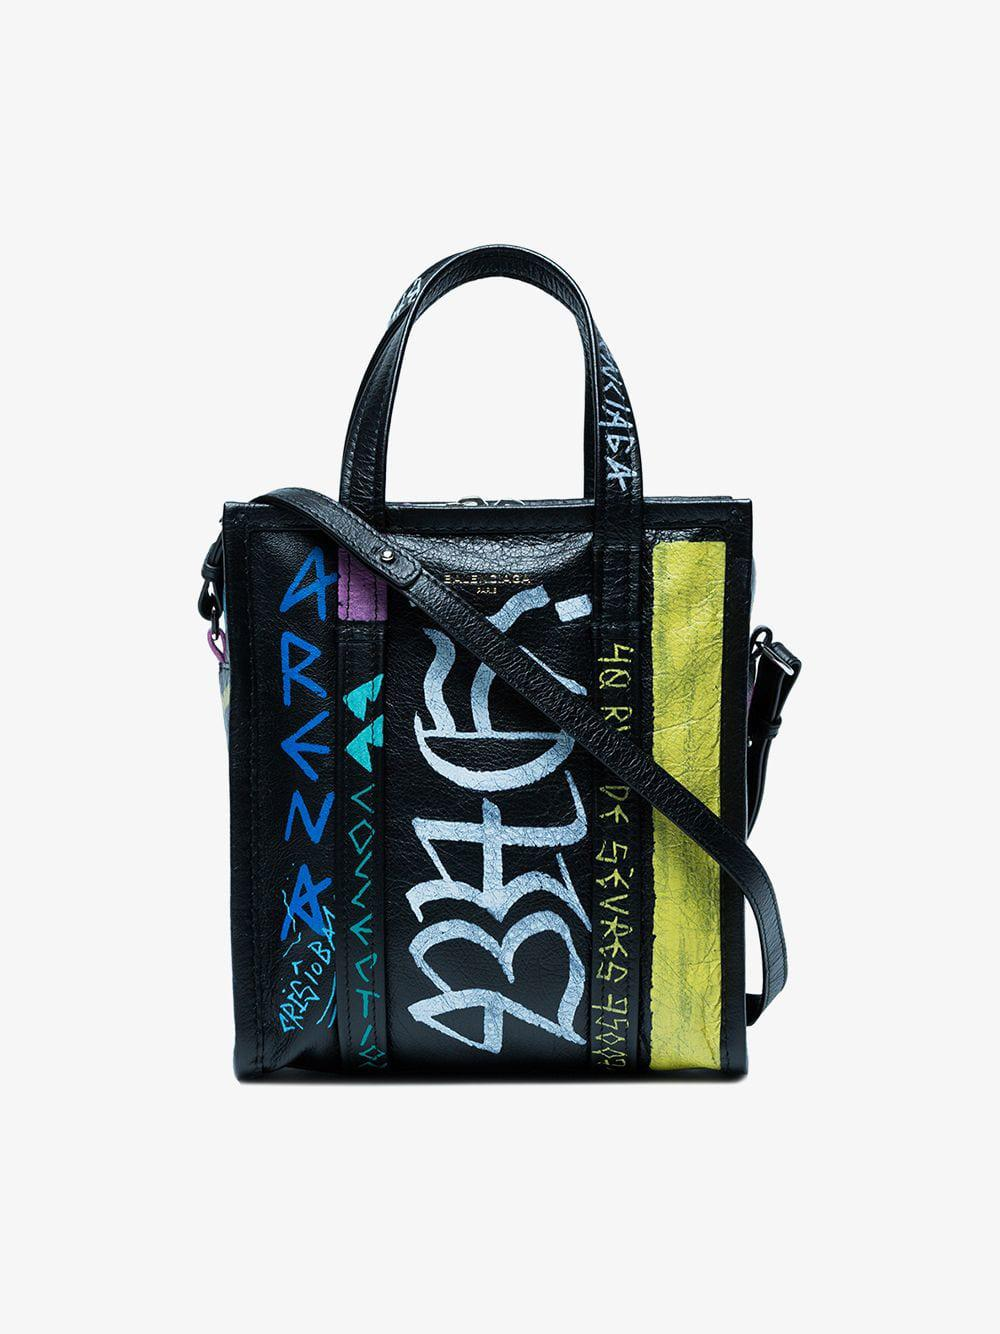 Lyst - Balenciaga Bazar Shopper Xs Graffiti Tote in Black - Save 6% 75c00ed419c59